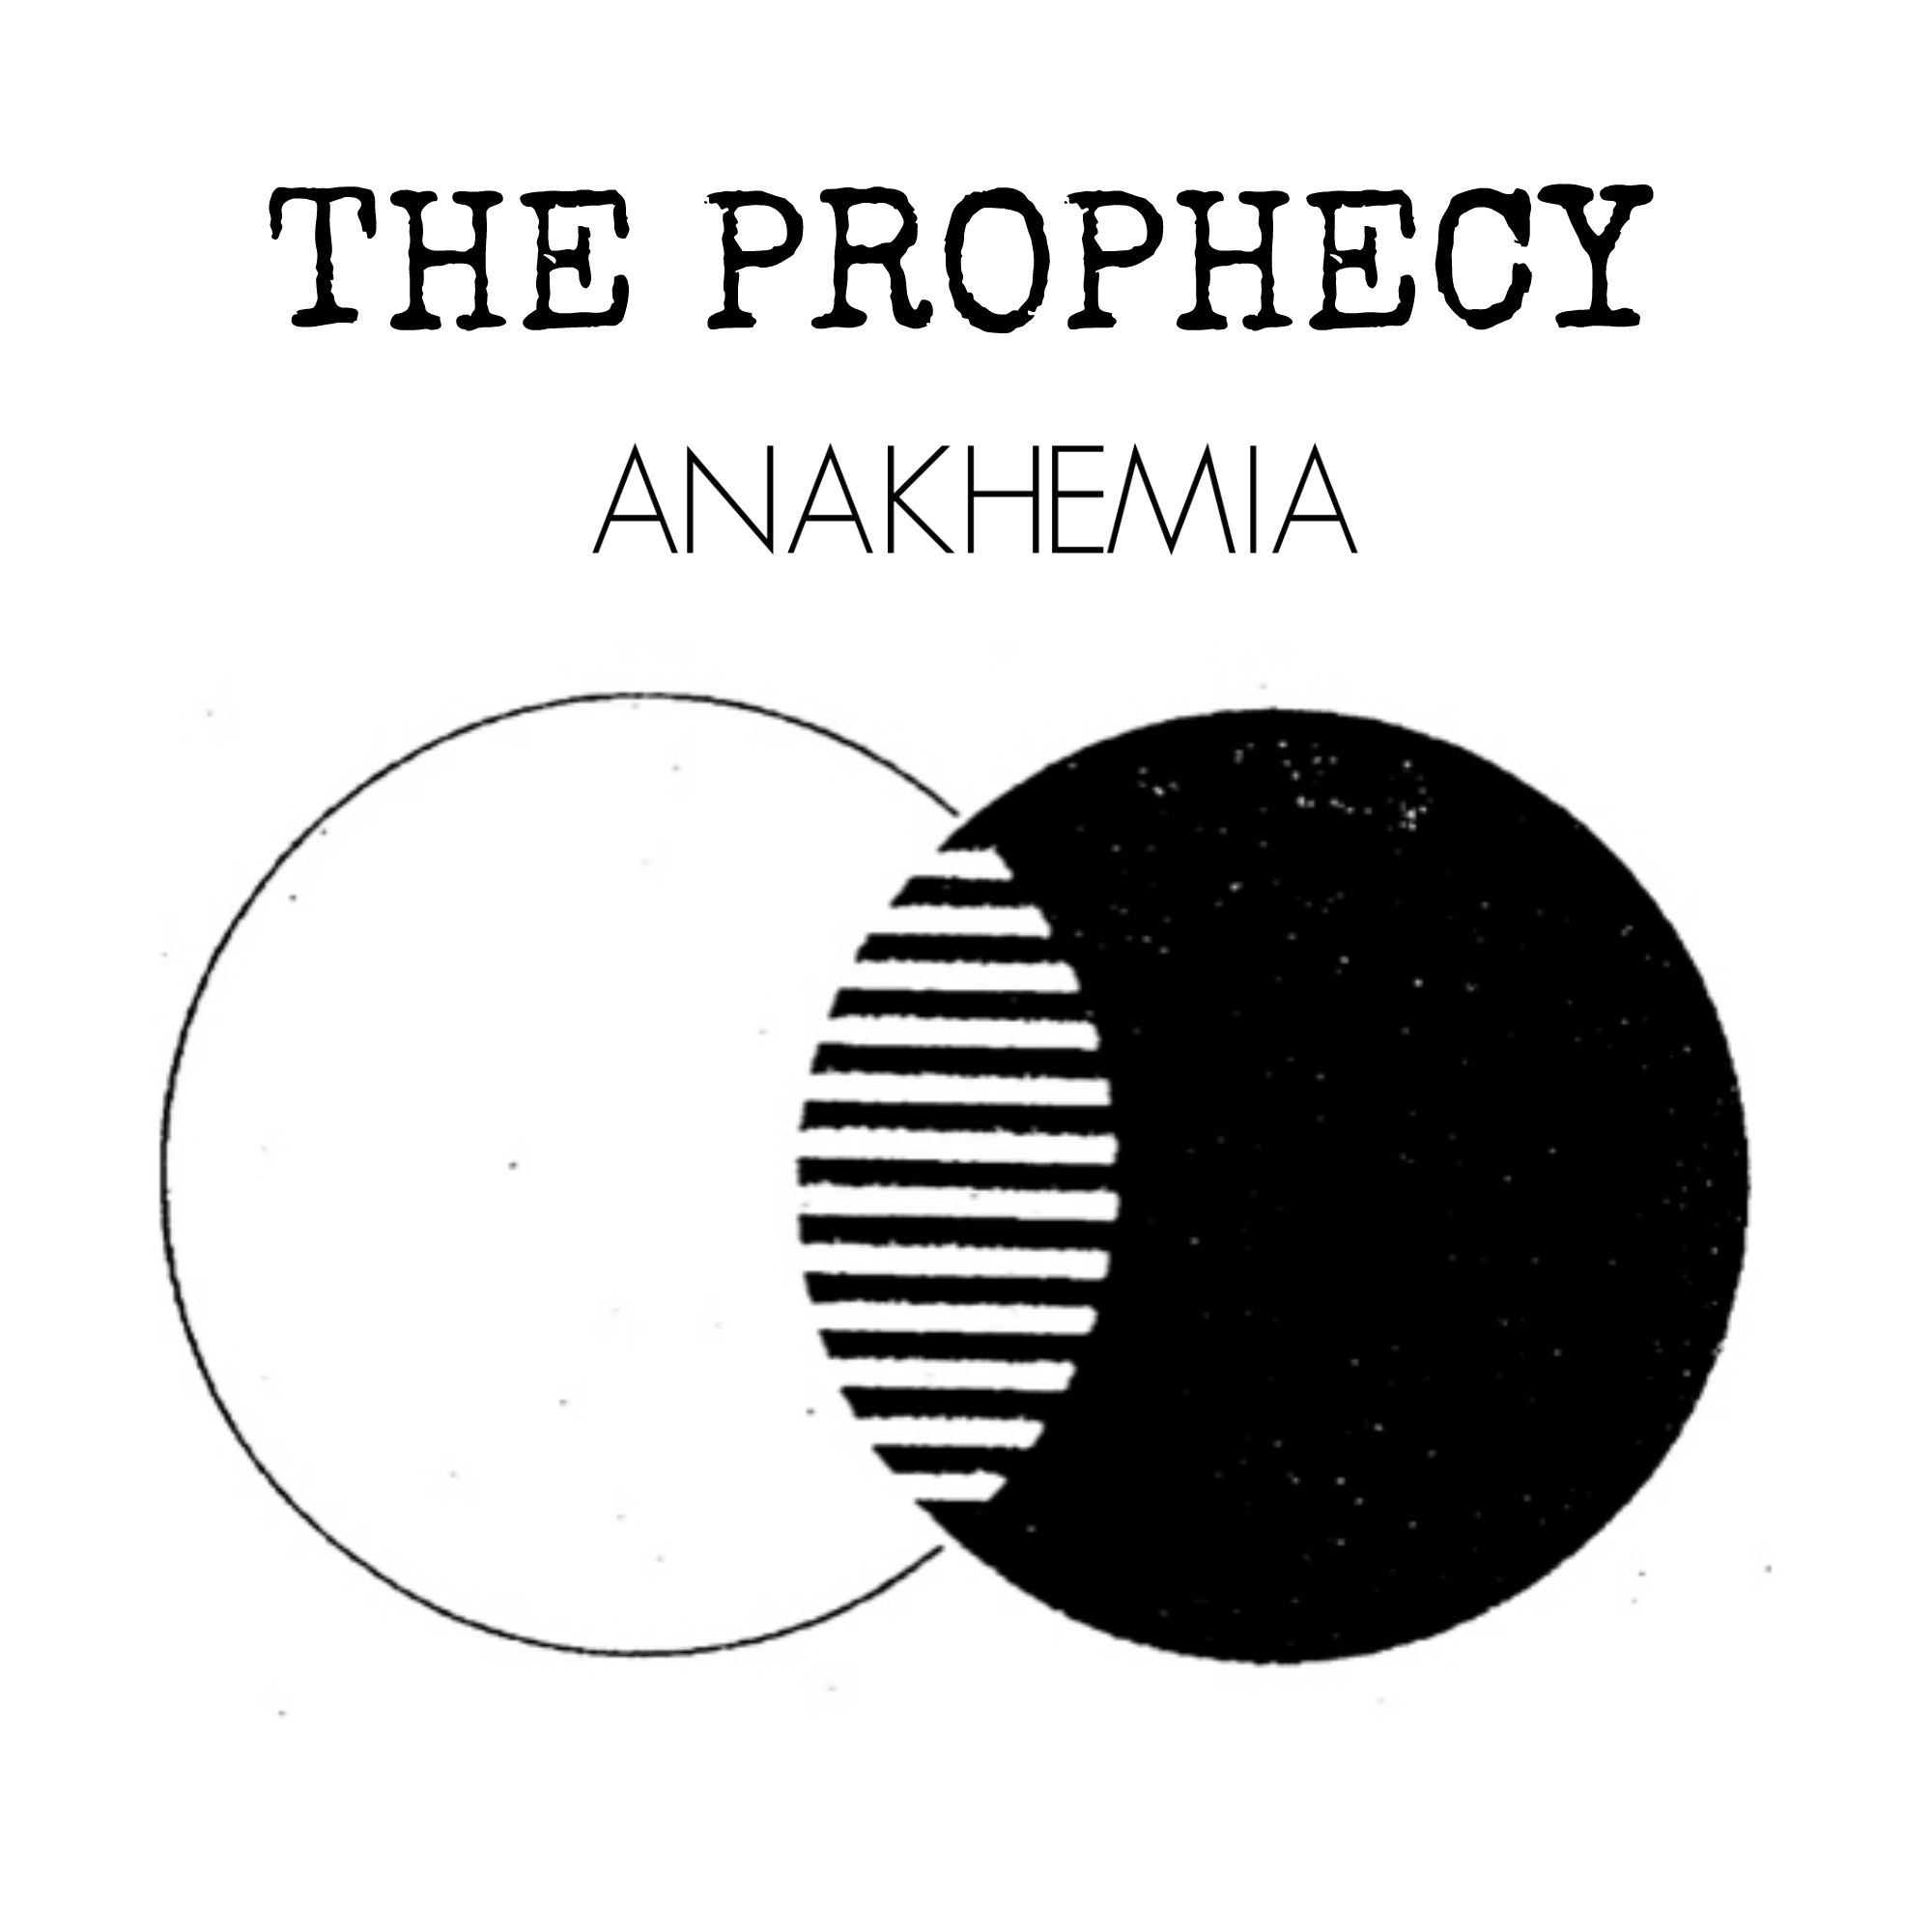 the_prophecy_artwork.jpg